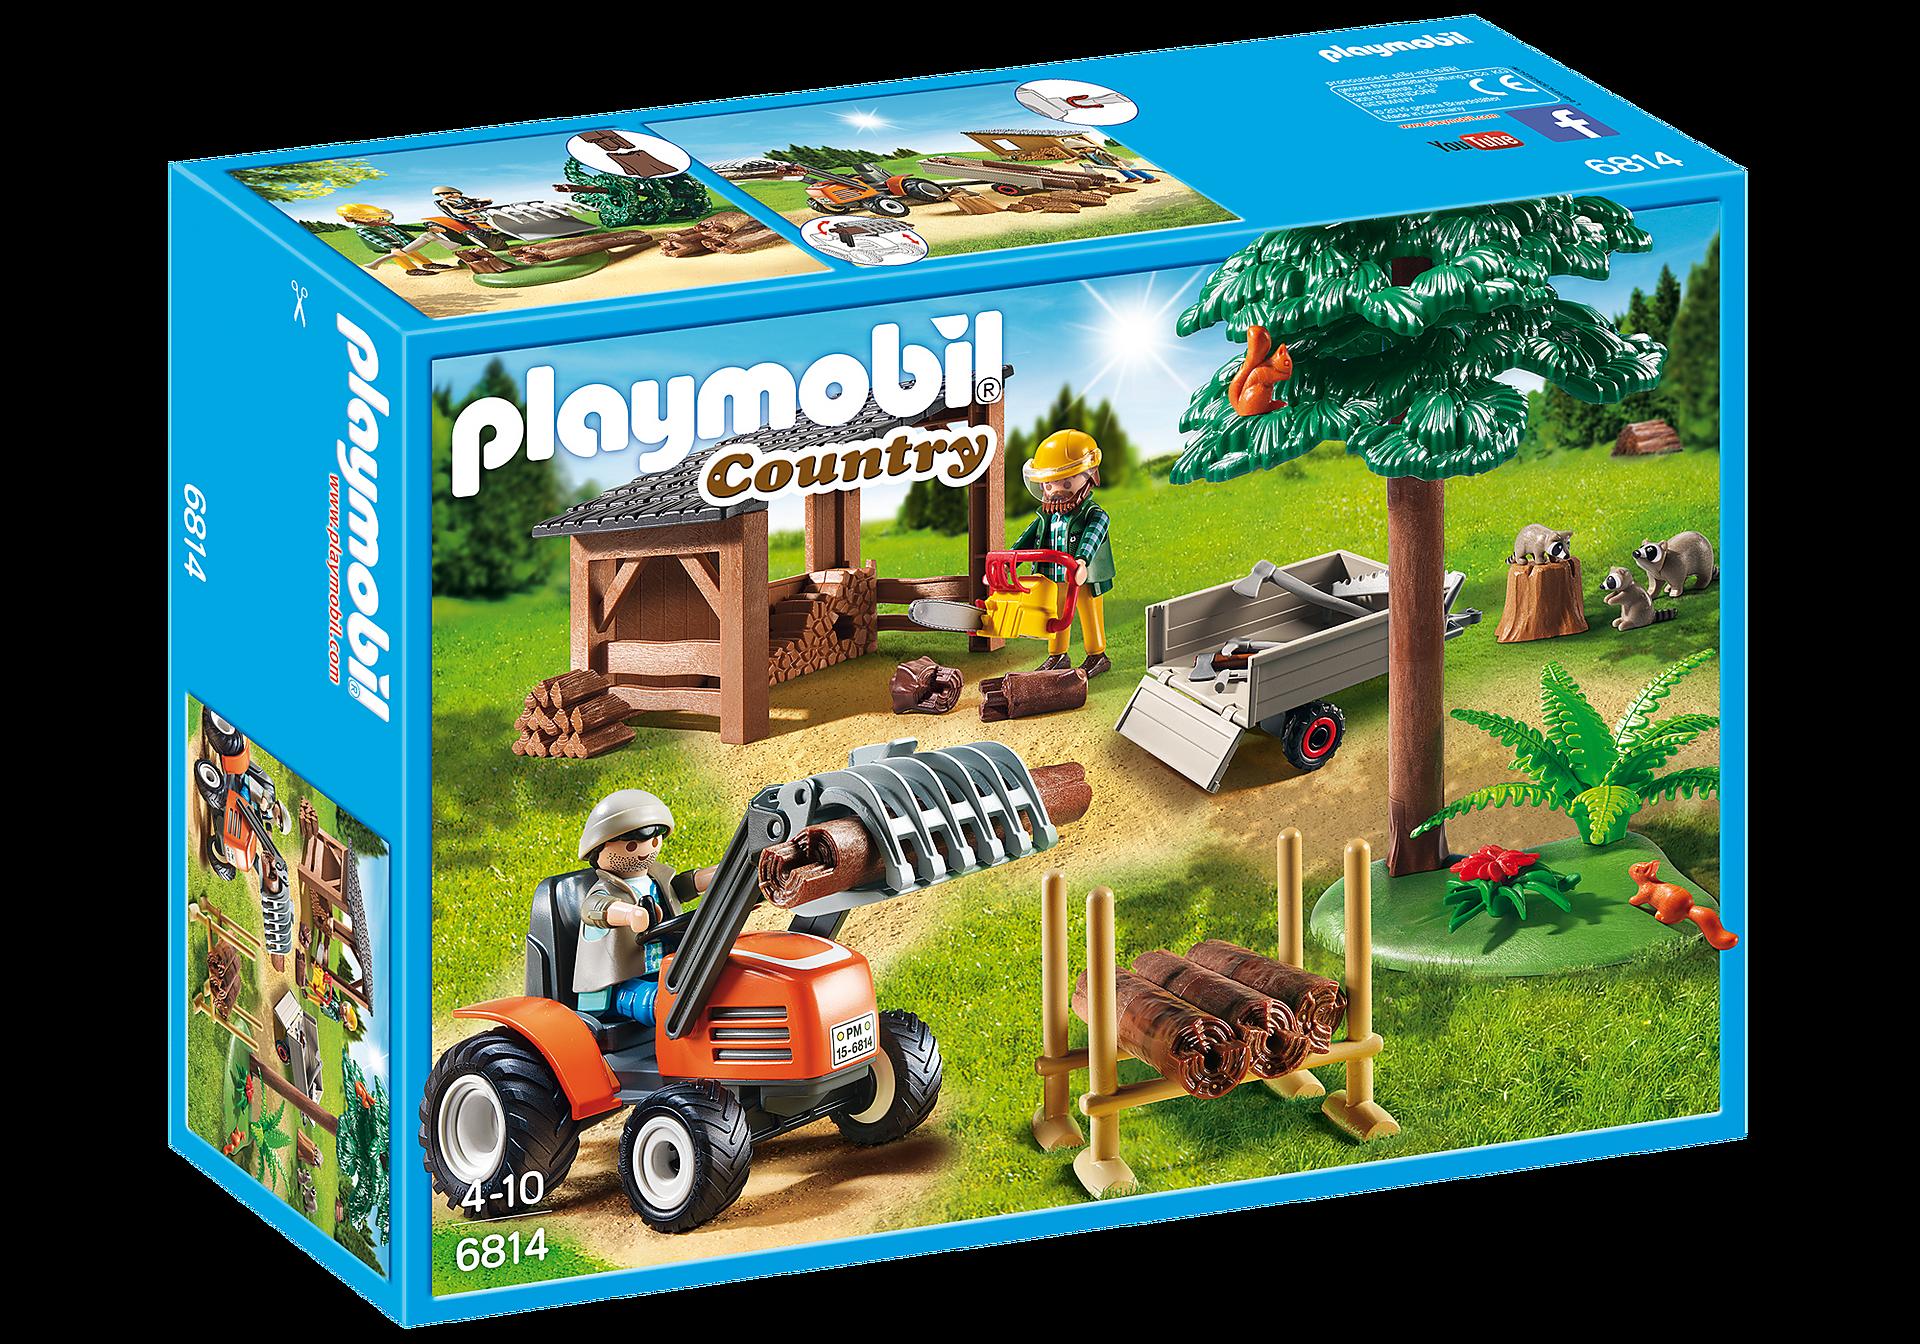 http://media.playmobil.com/i/playmobil/6814_product_box_front/Véhicule de débardage avec bûcherons